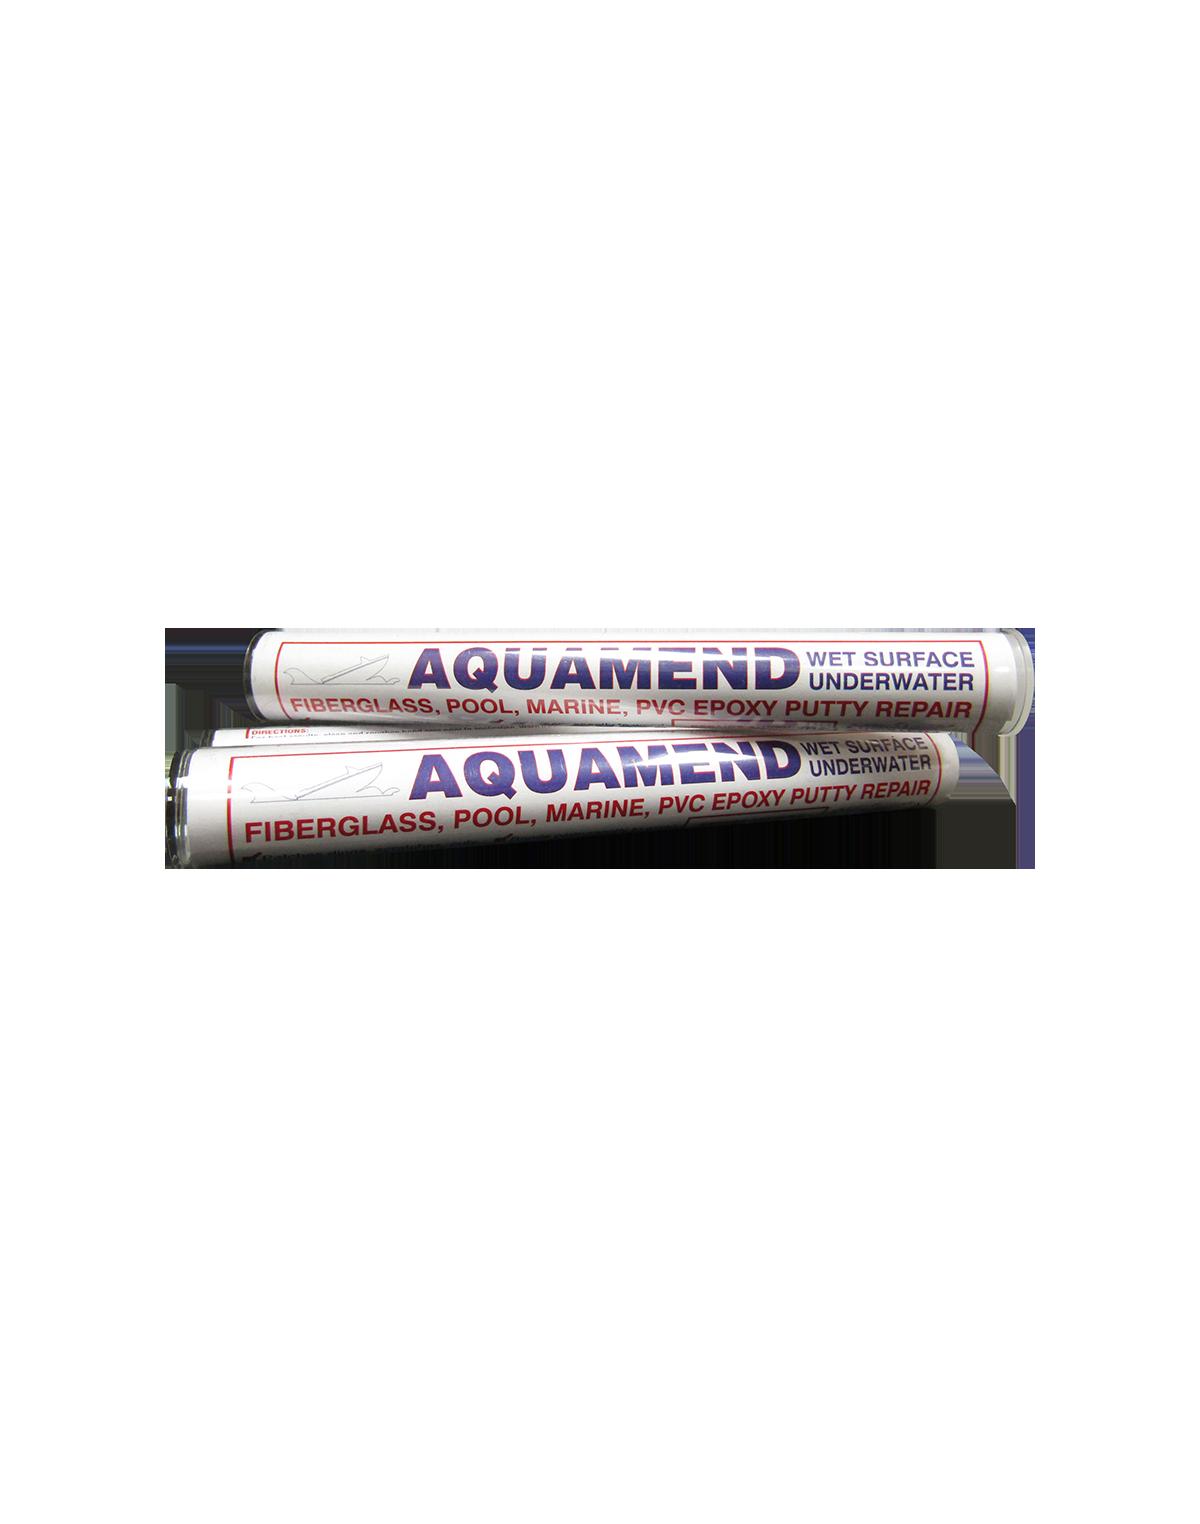 Aquamend Product - Nationwide Protective Coatings